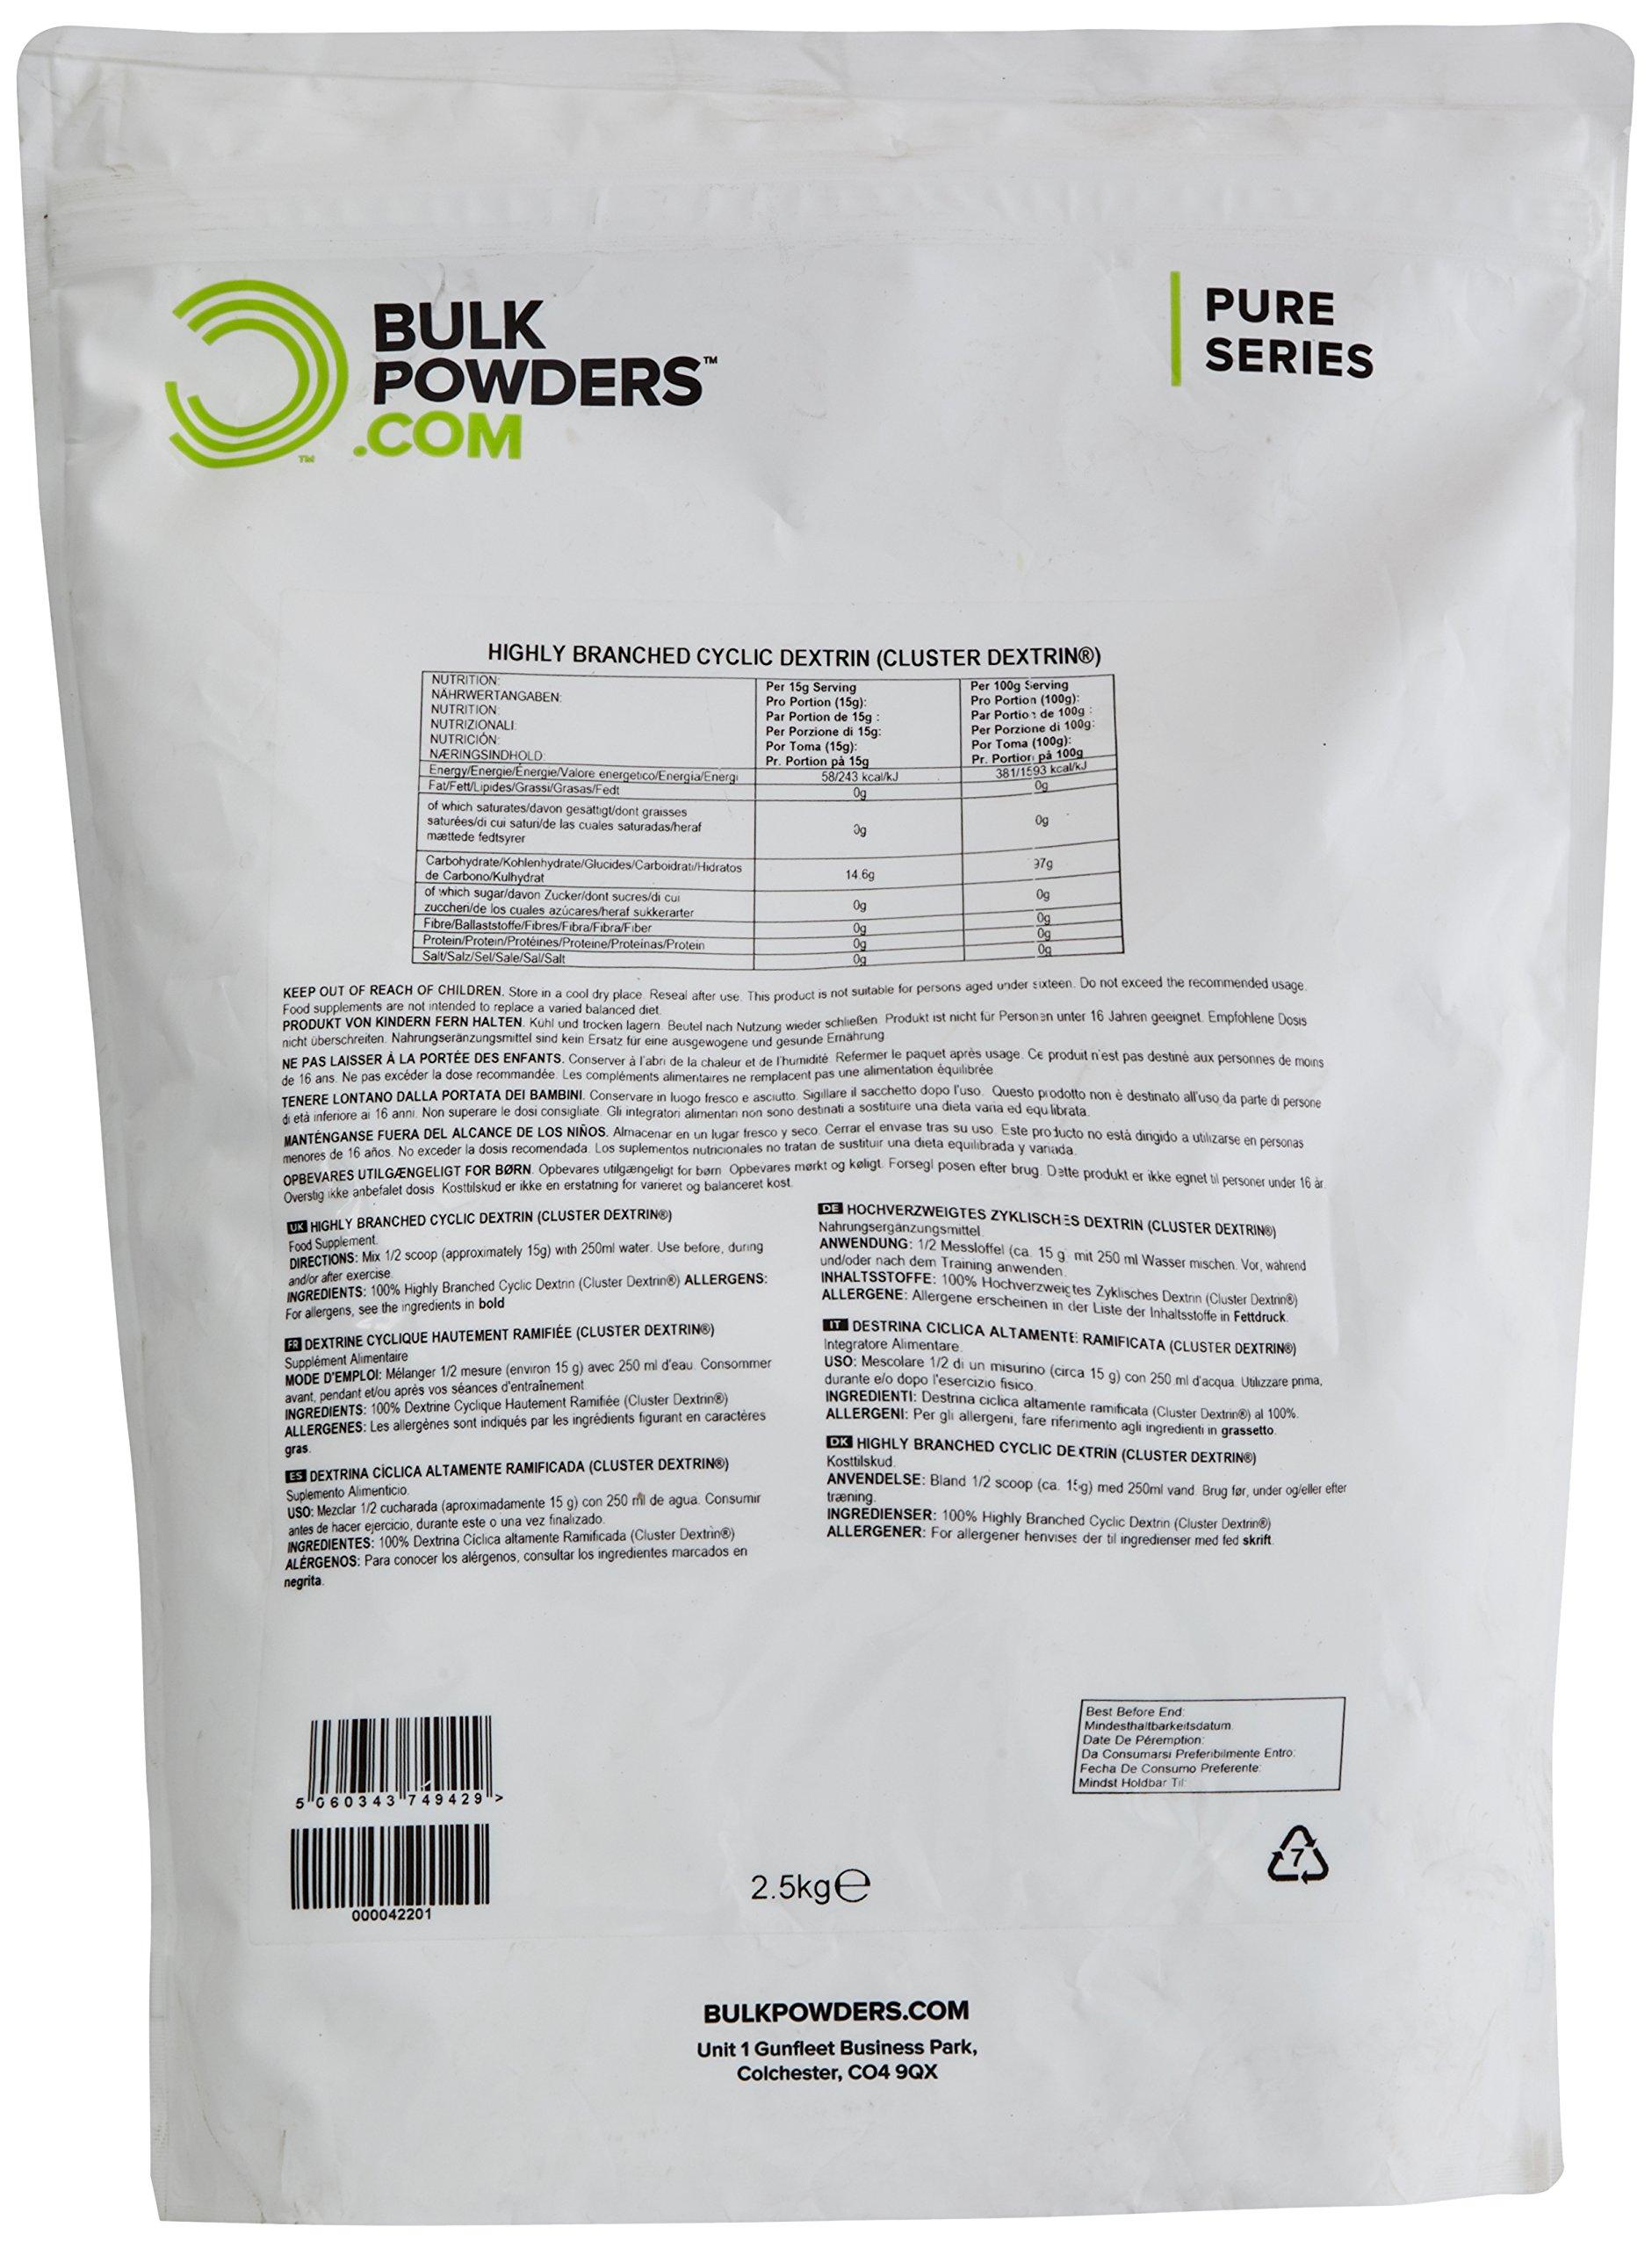 9109gviC9LL - Bulk Highly Branched Cyclic Dextrin Powder, 2.5 kg, Packaging May Vary